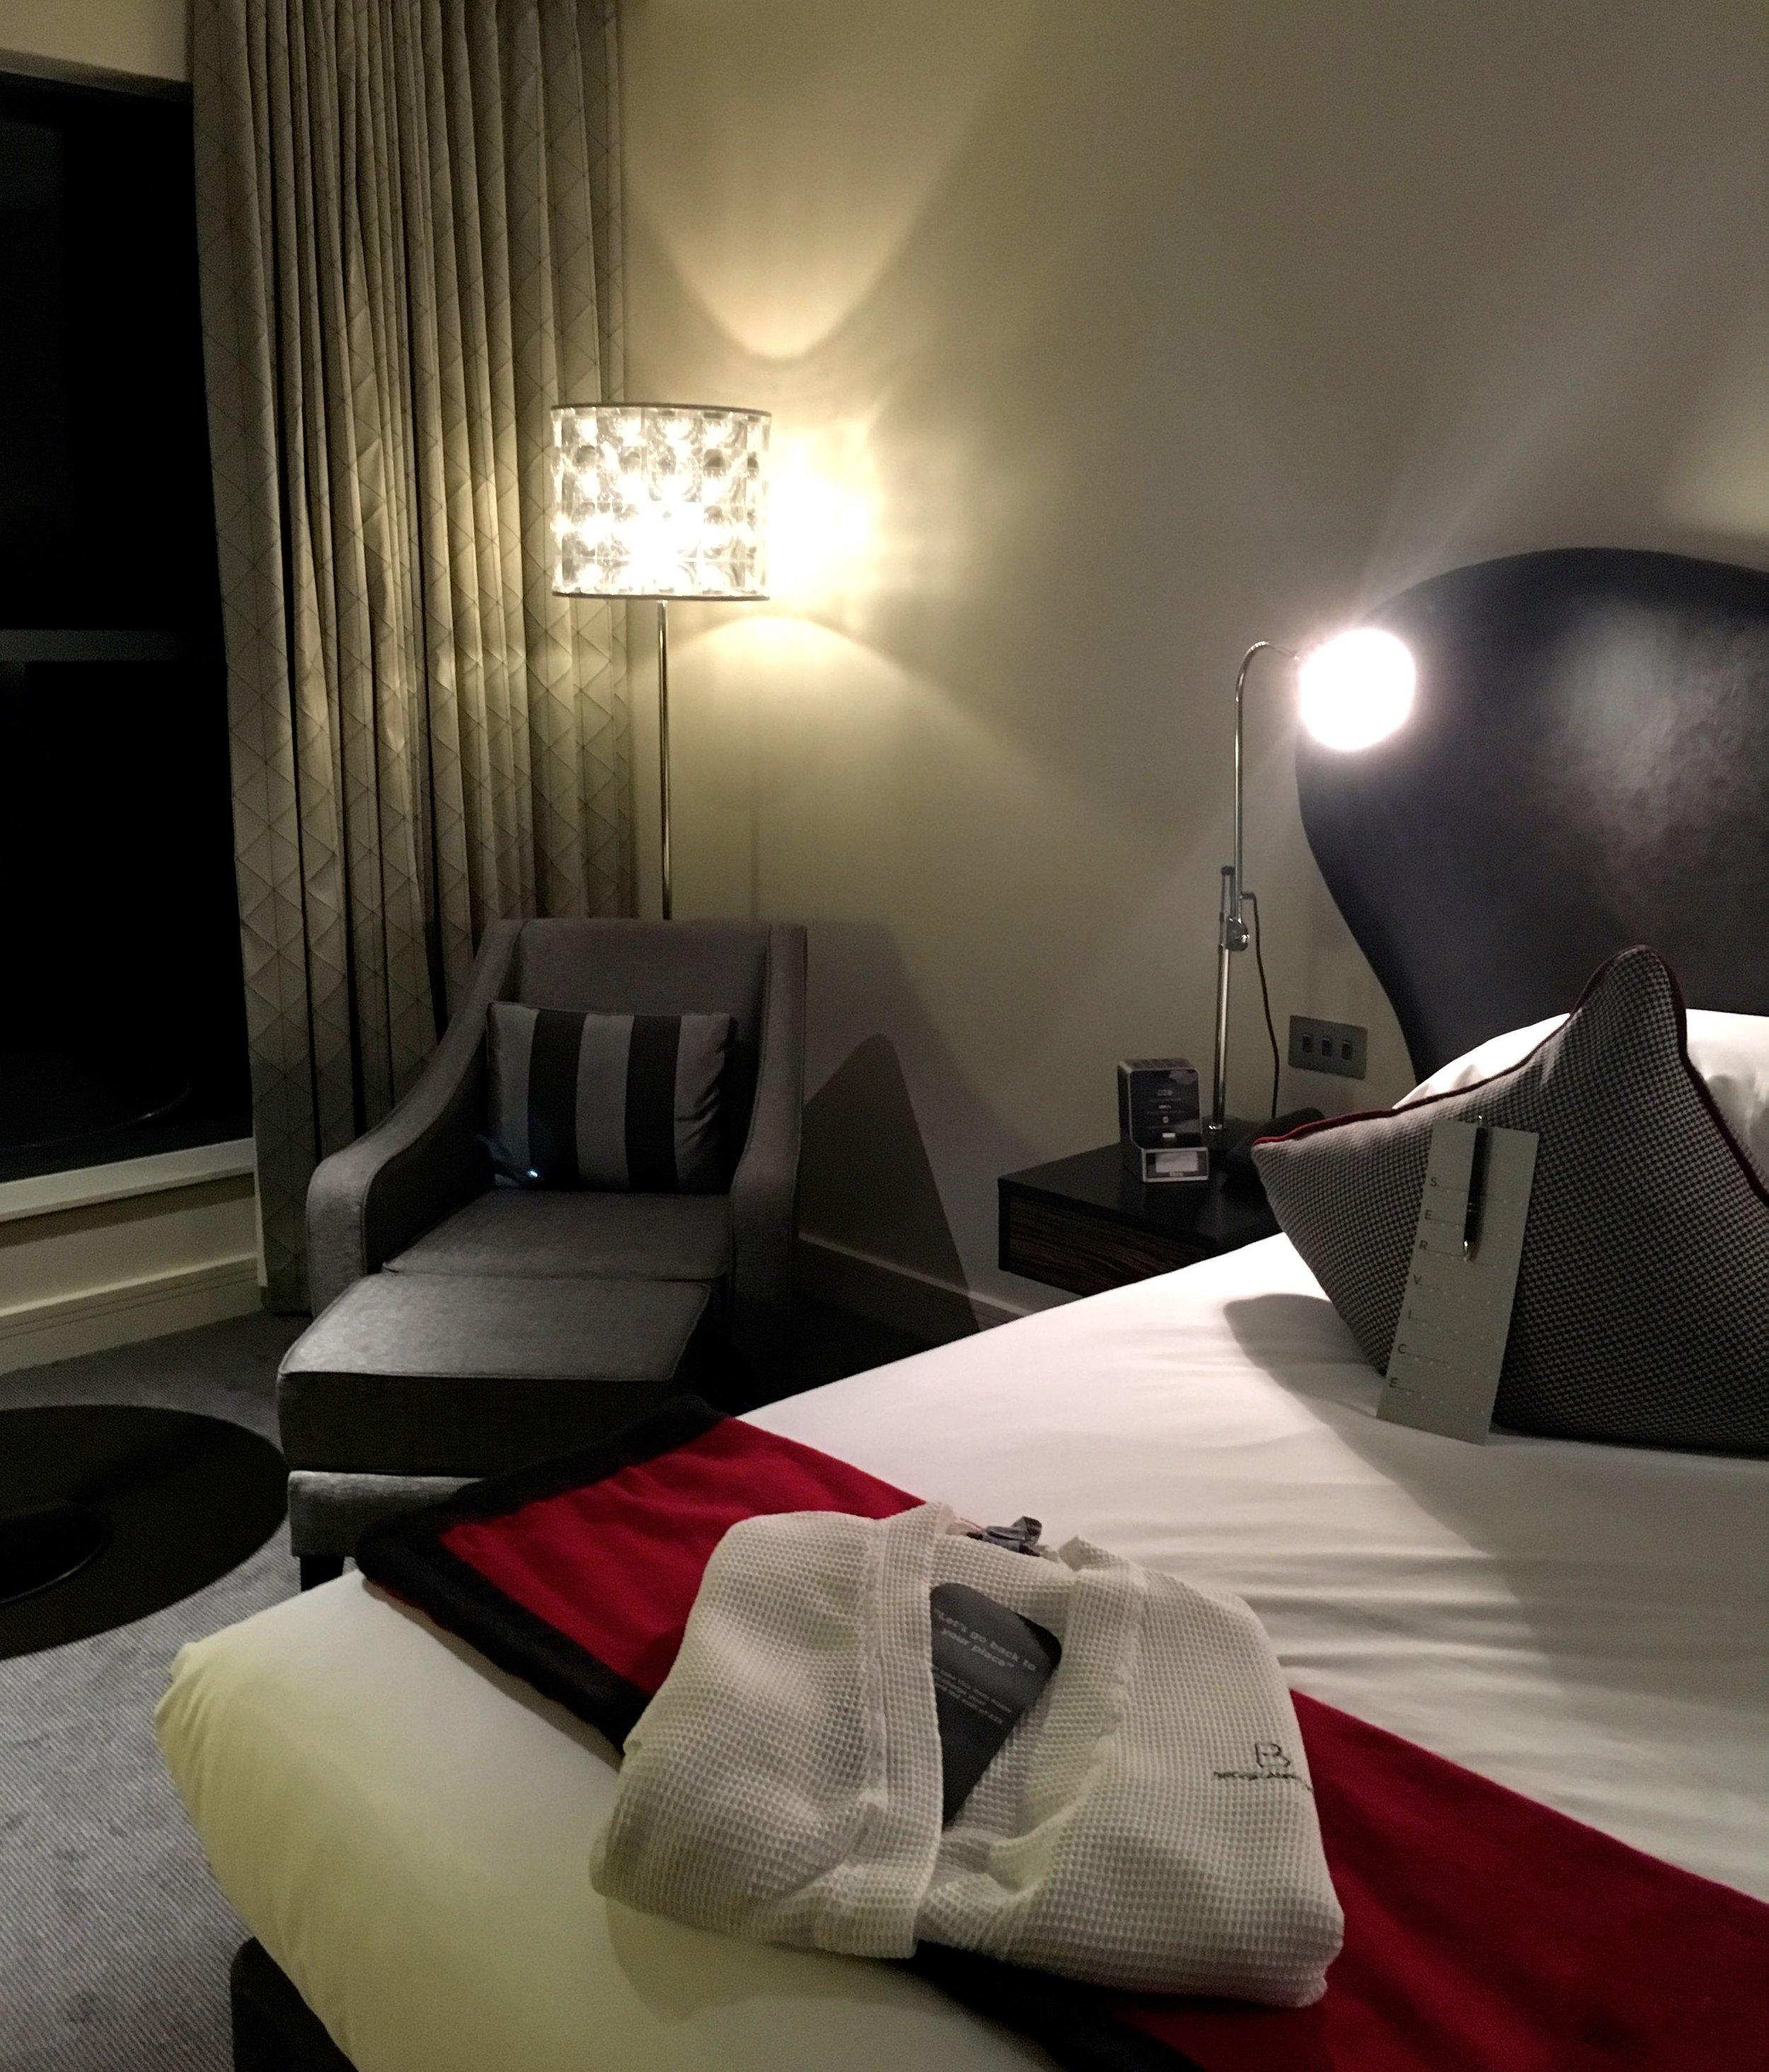 Our room at Brooklands hotel in Weybridge